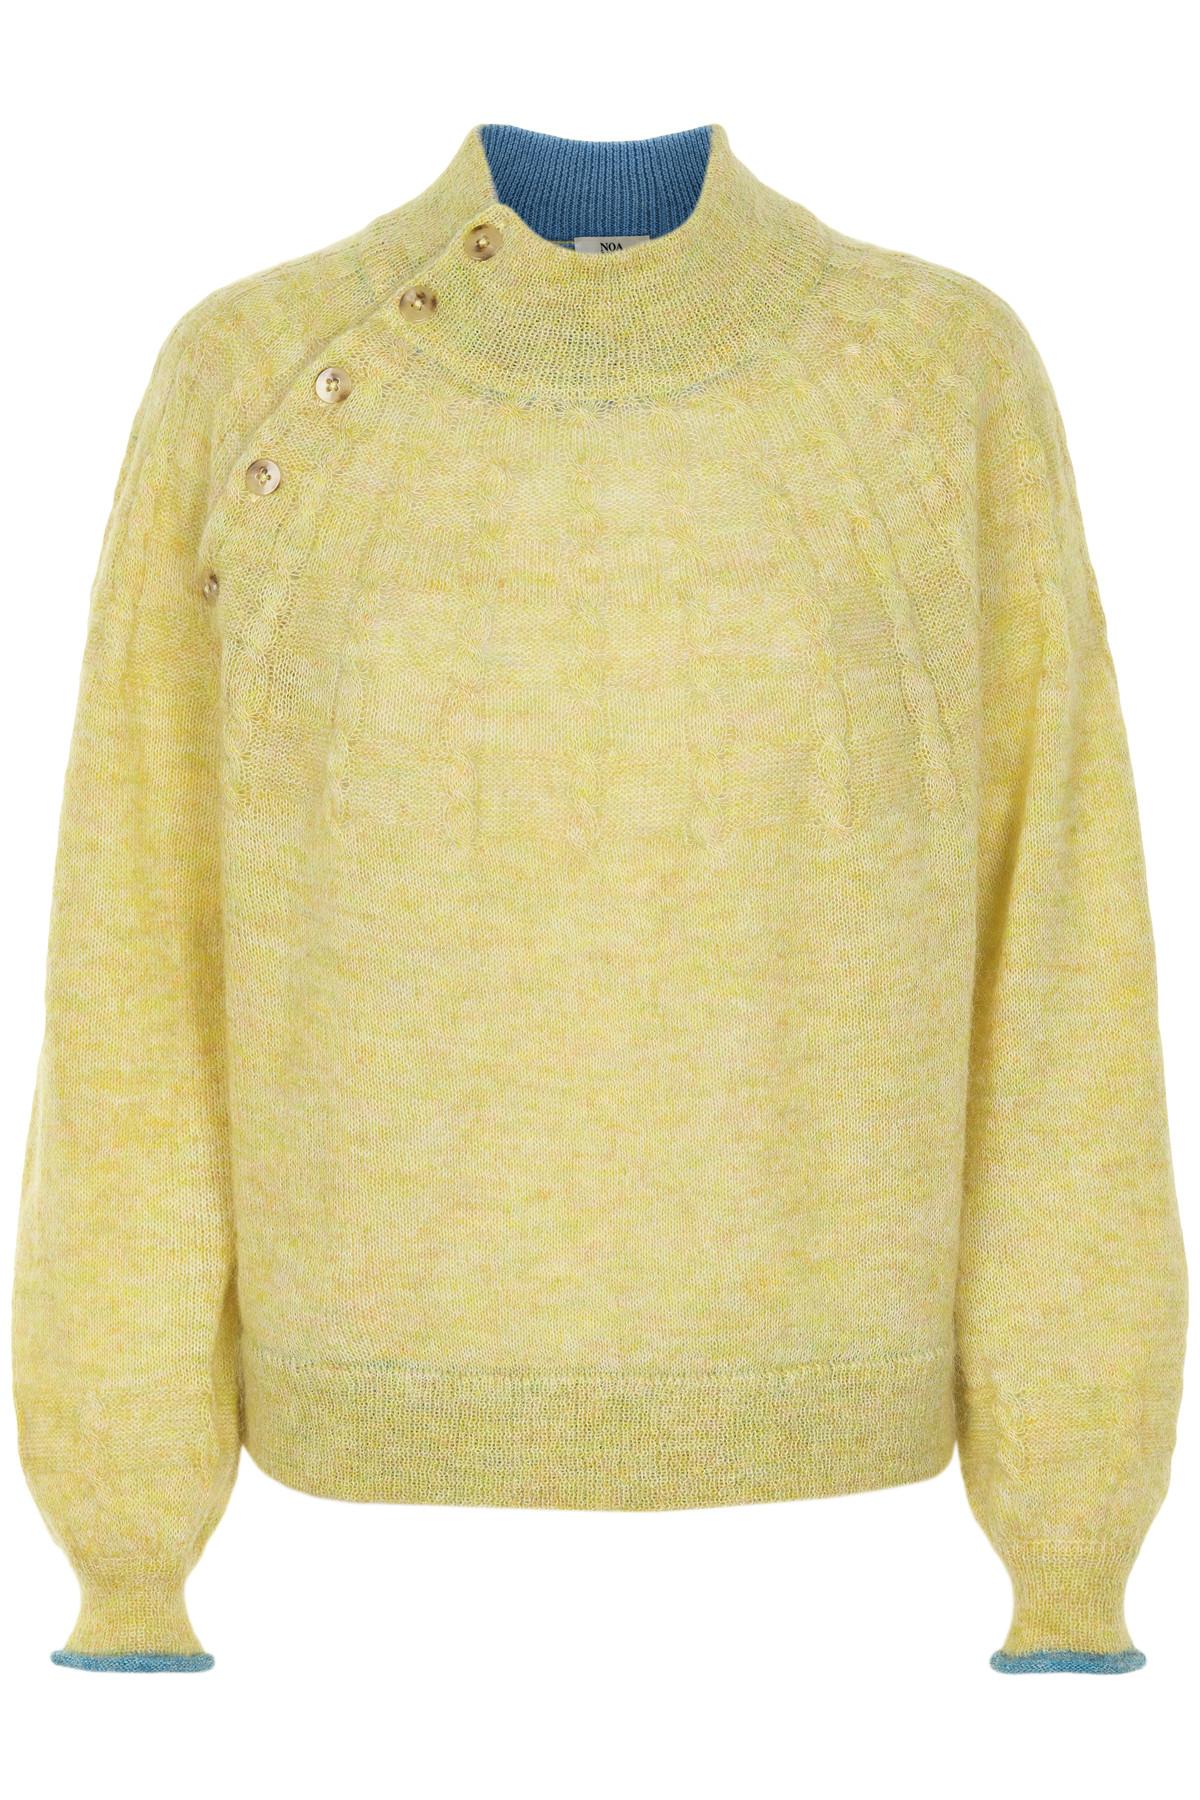 Image of   NOA NOA PULLOVER 1-9614-1 001027 (Yellow, L)